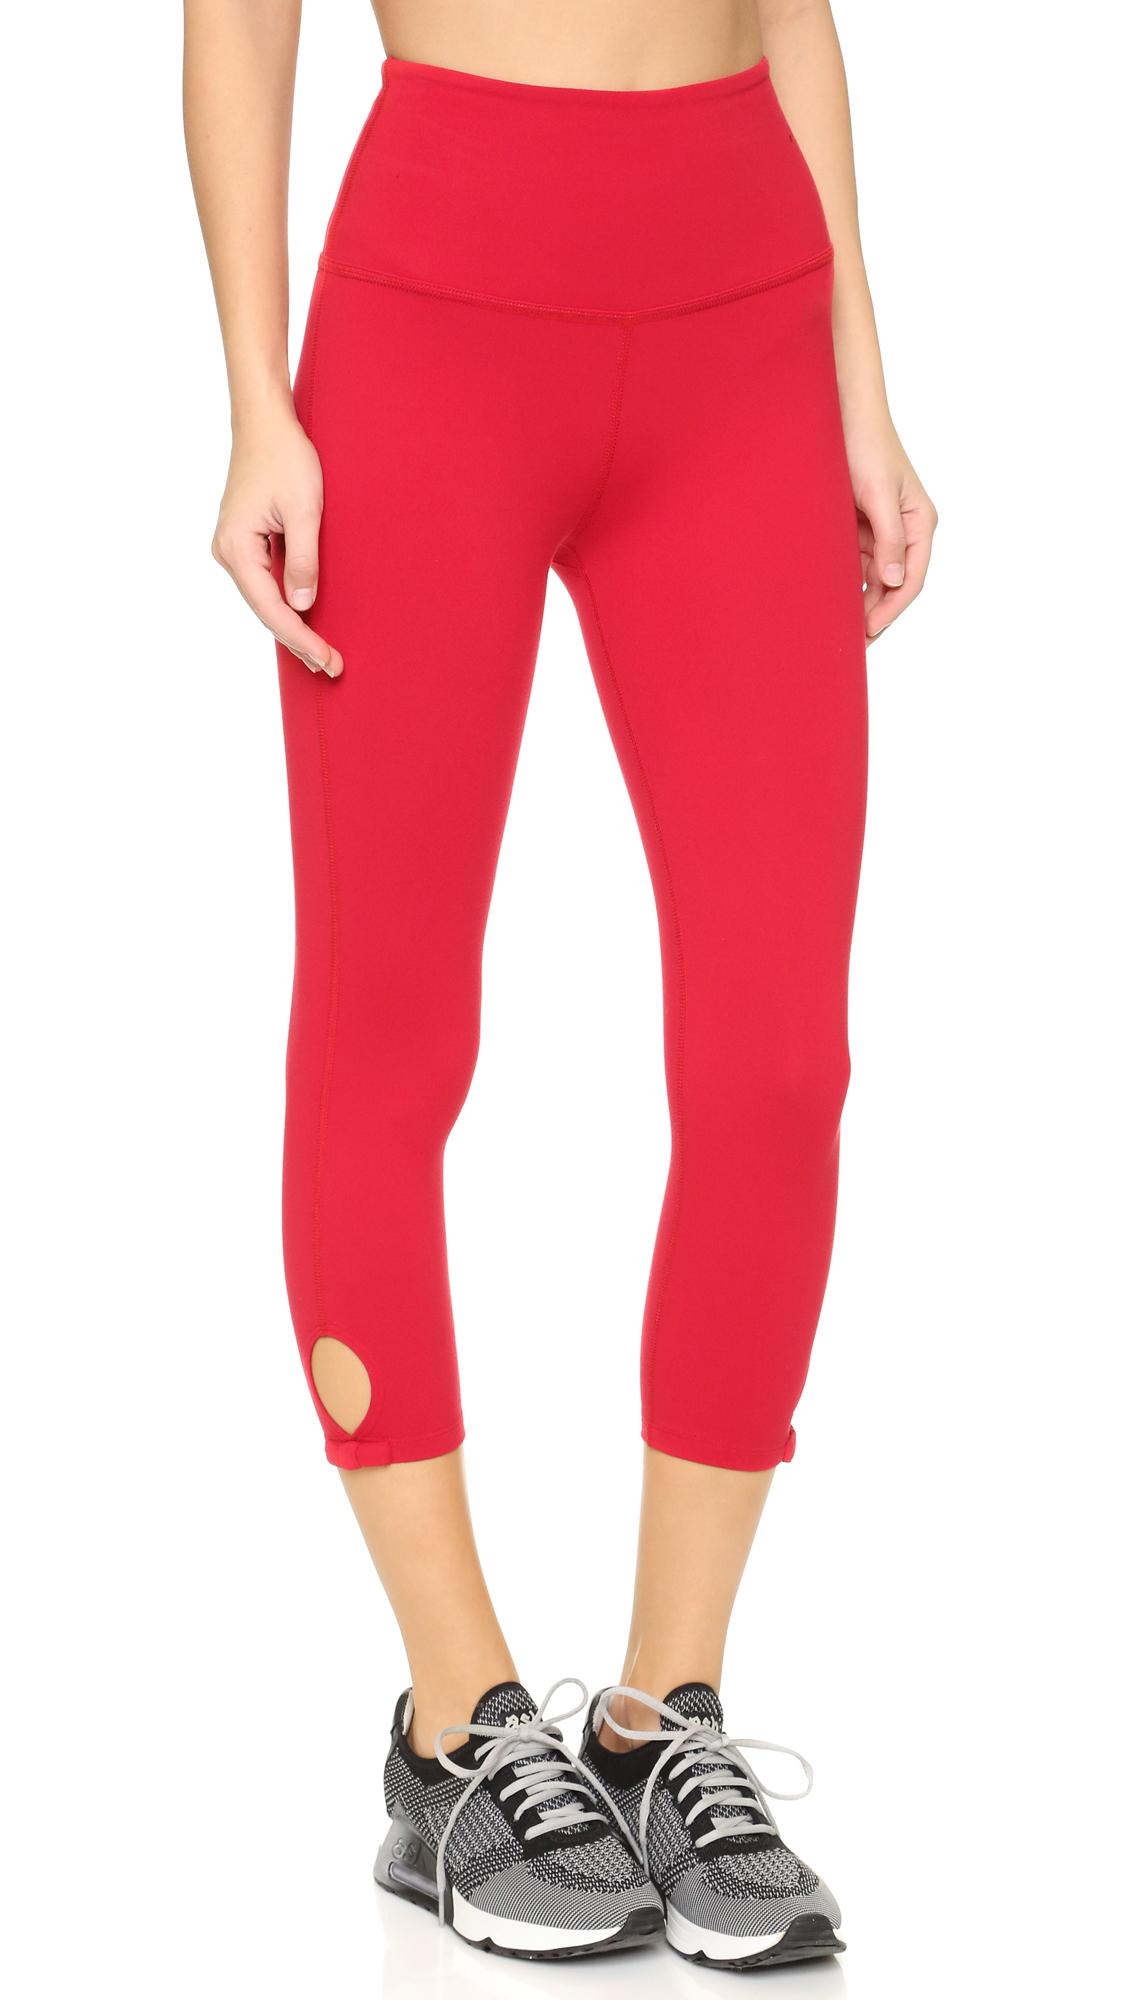 Lyst Beyond Yoga Kate Spade Bow Capri Leggings In Red